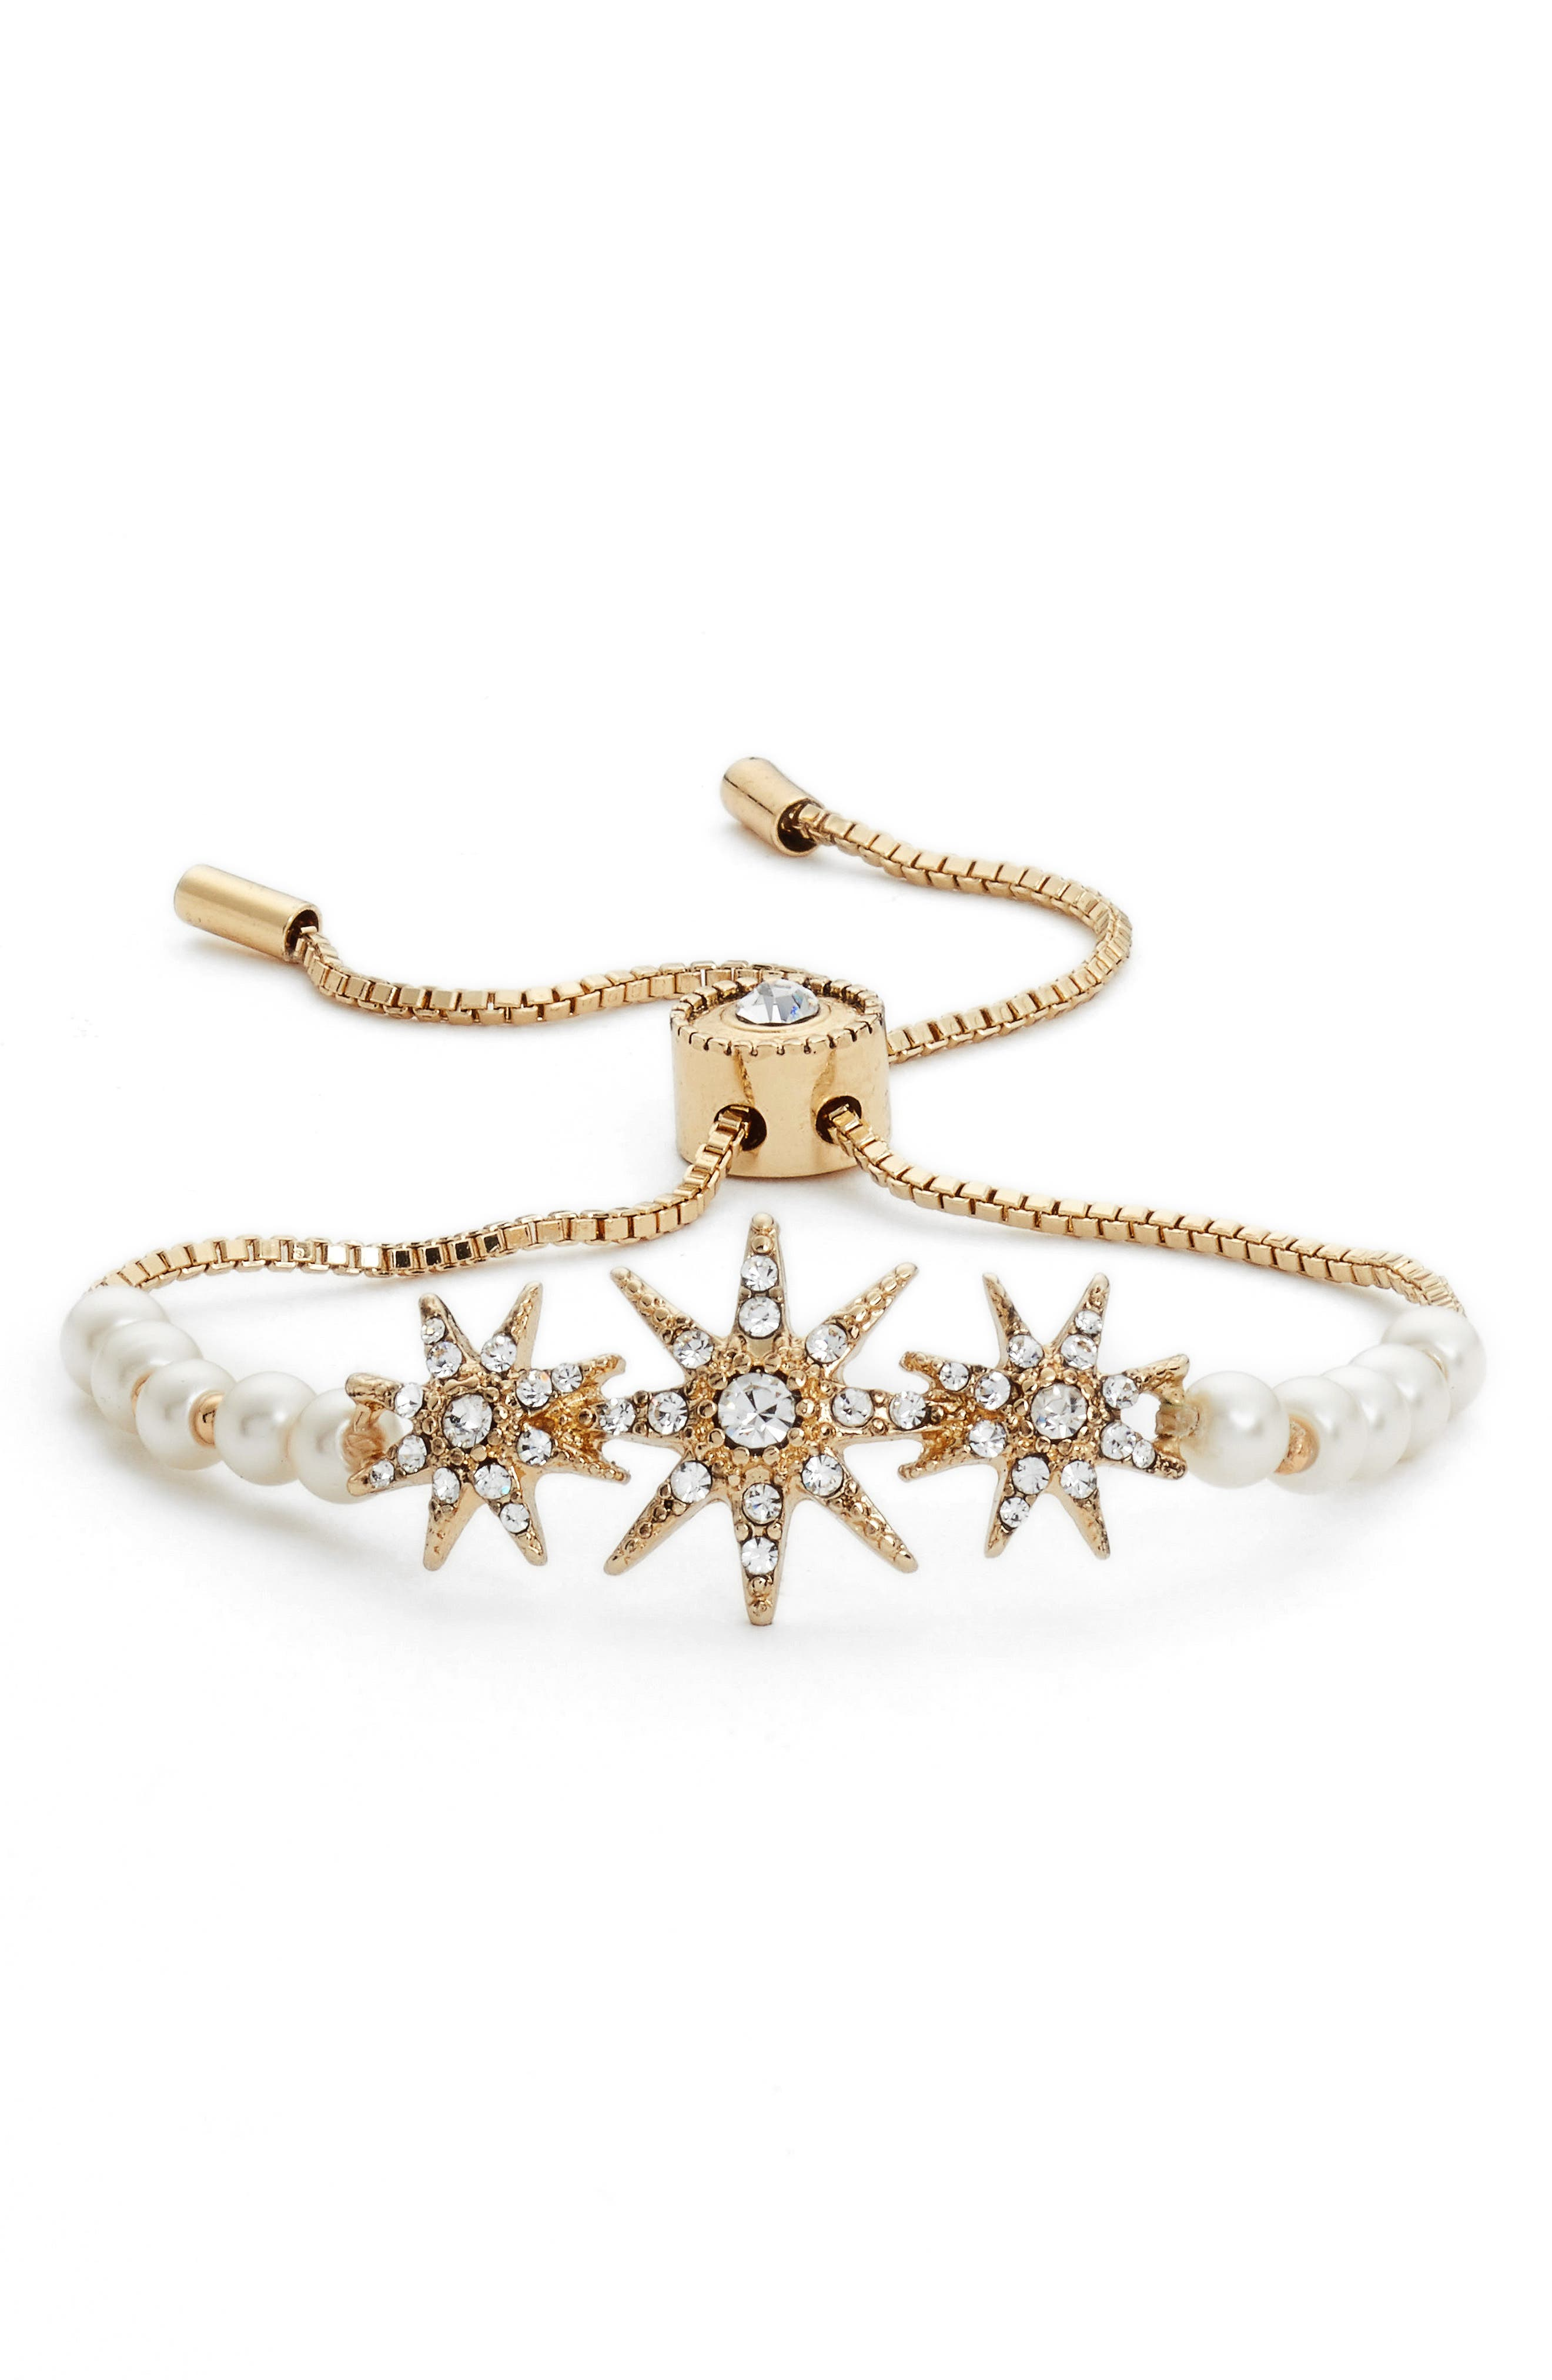 Main Image - Jenny Packham Star Adjustable Bracelet